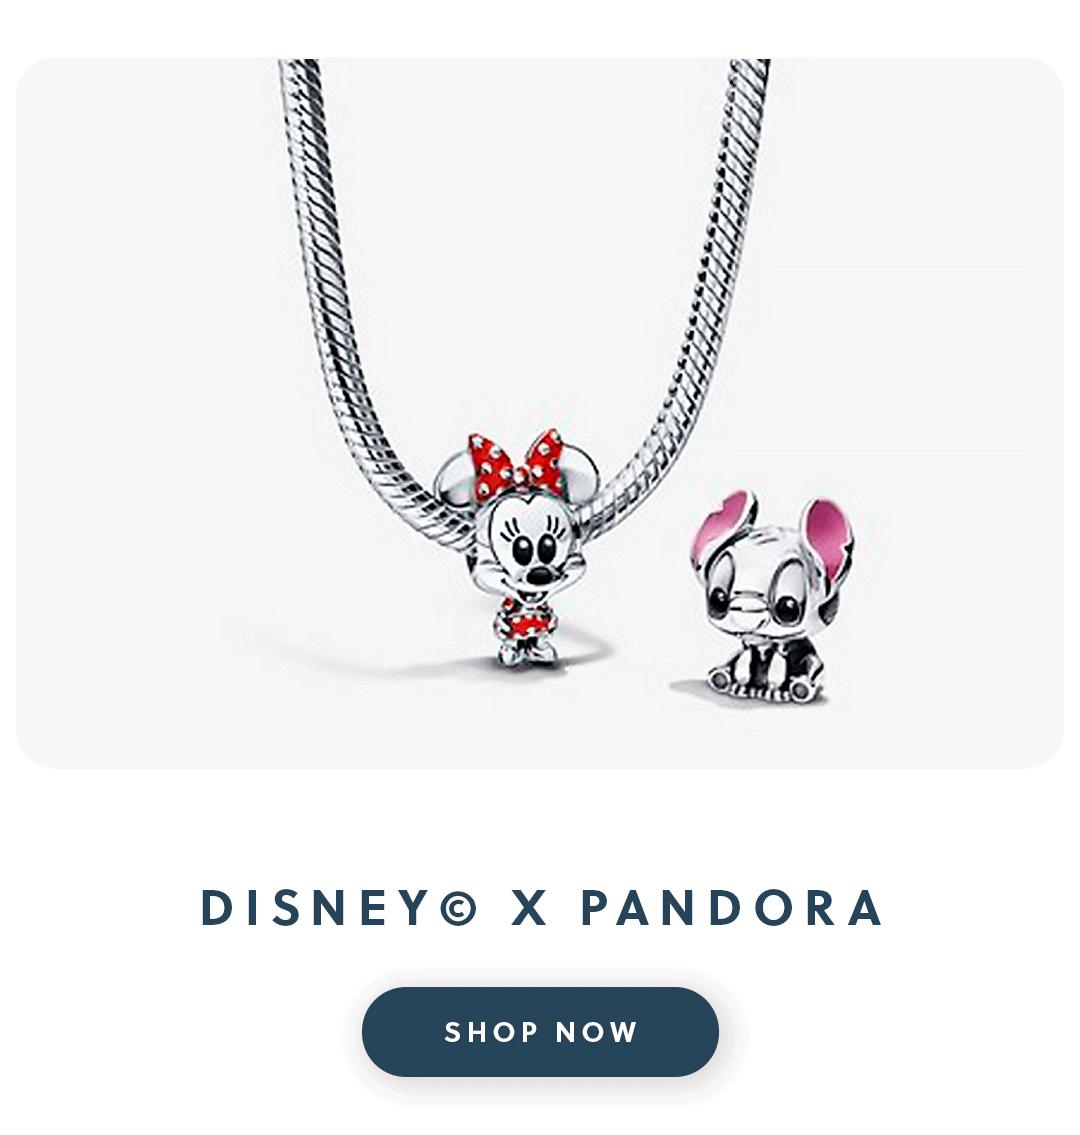 A close up of a Pandora bracelet with a minnie mouse and stitch charm with text disney x pandora shop now